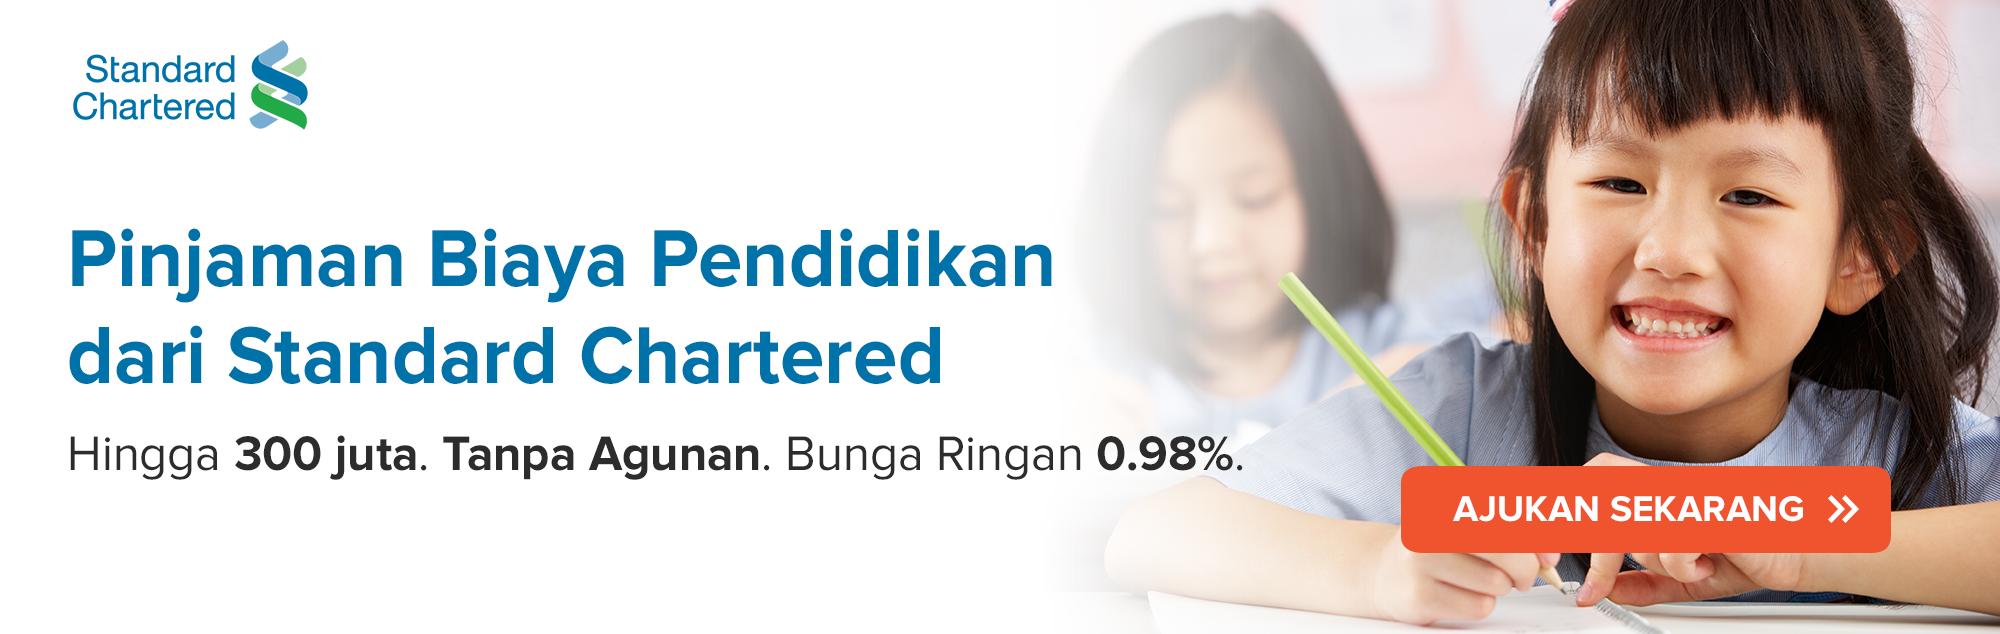 Promo Bank Standard Chartered